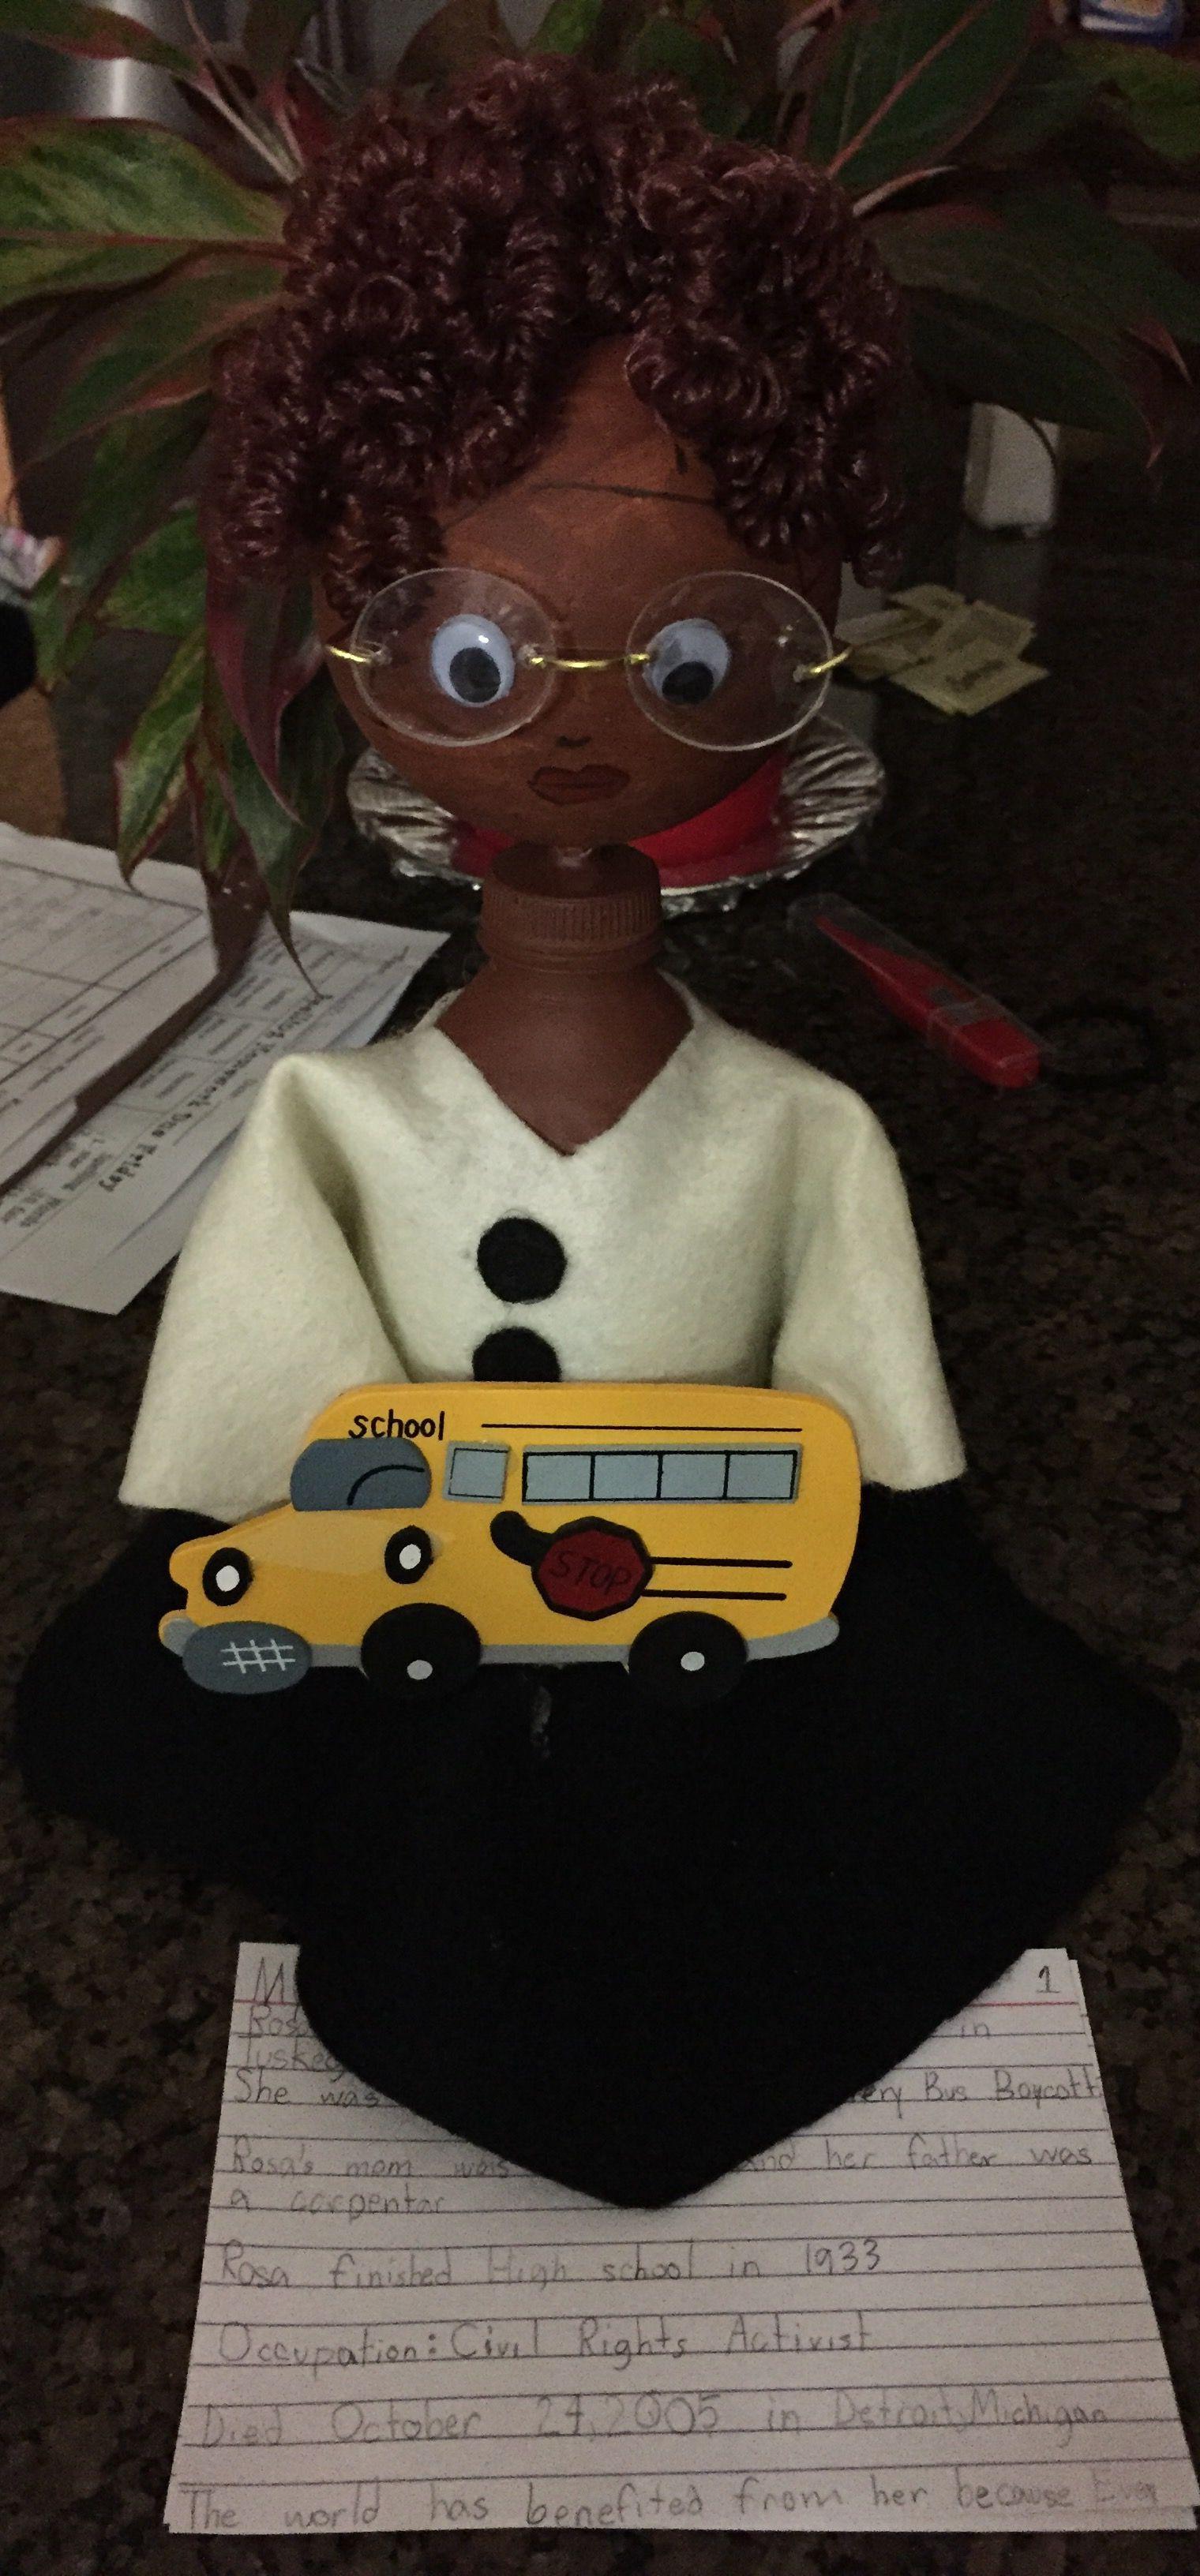 Rosa Parks Bottle Buddy